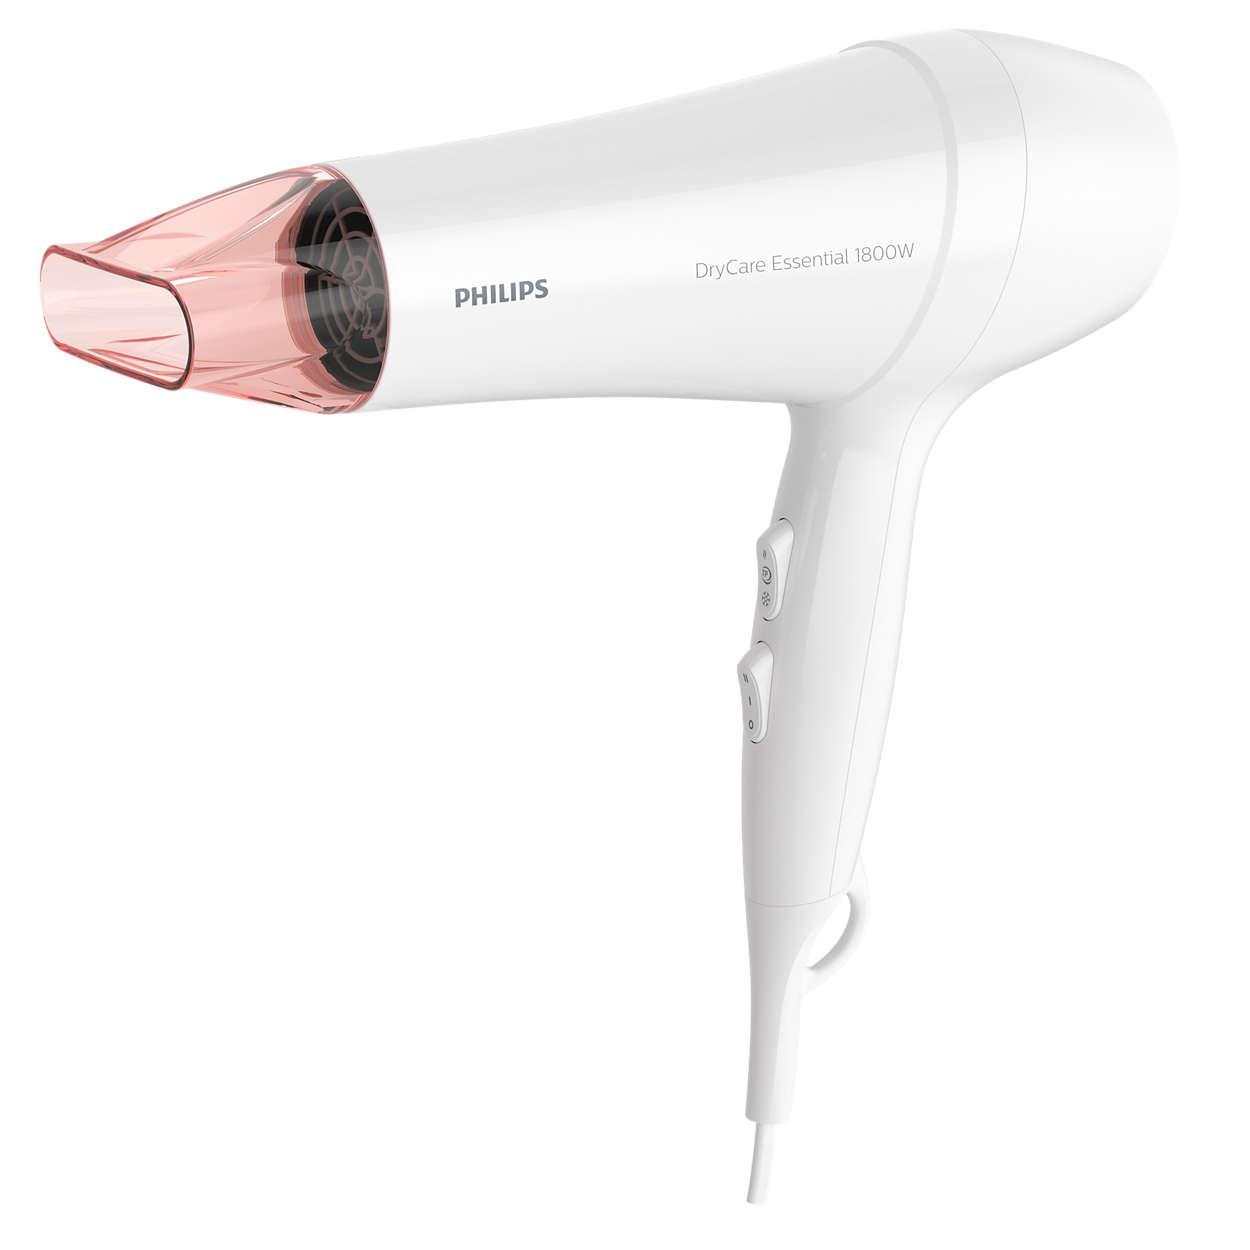 Asciugacapelli Philips Dry Care